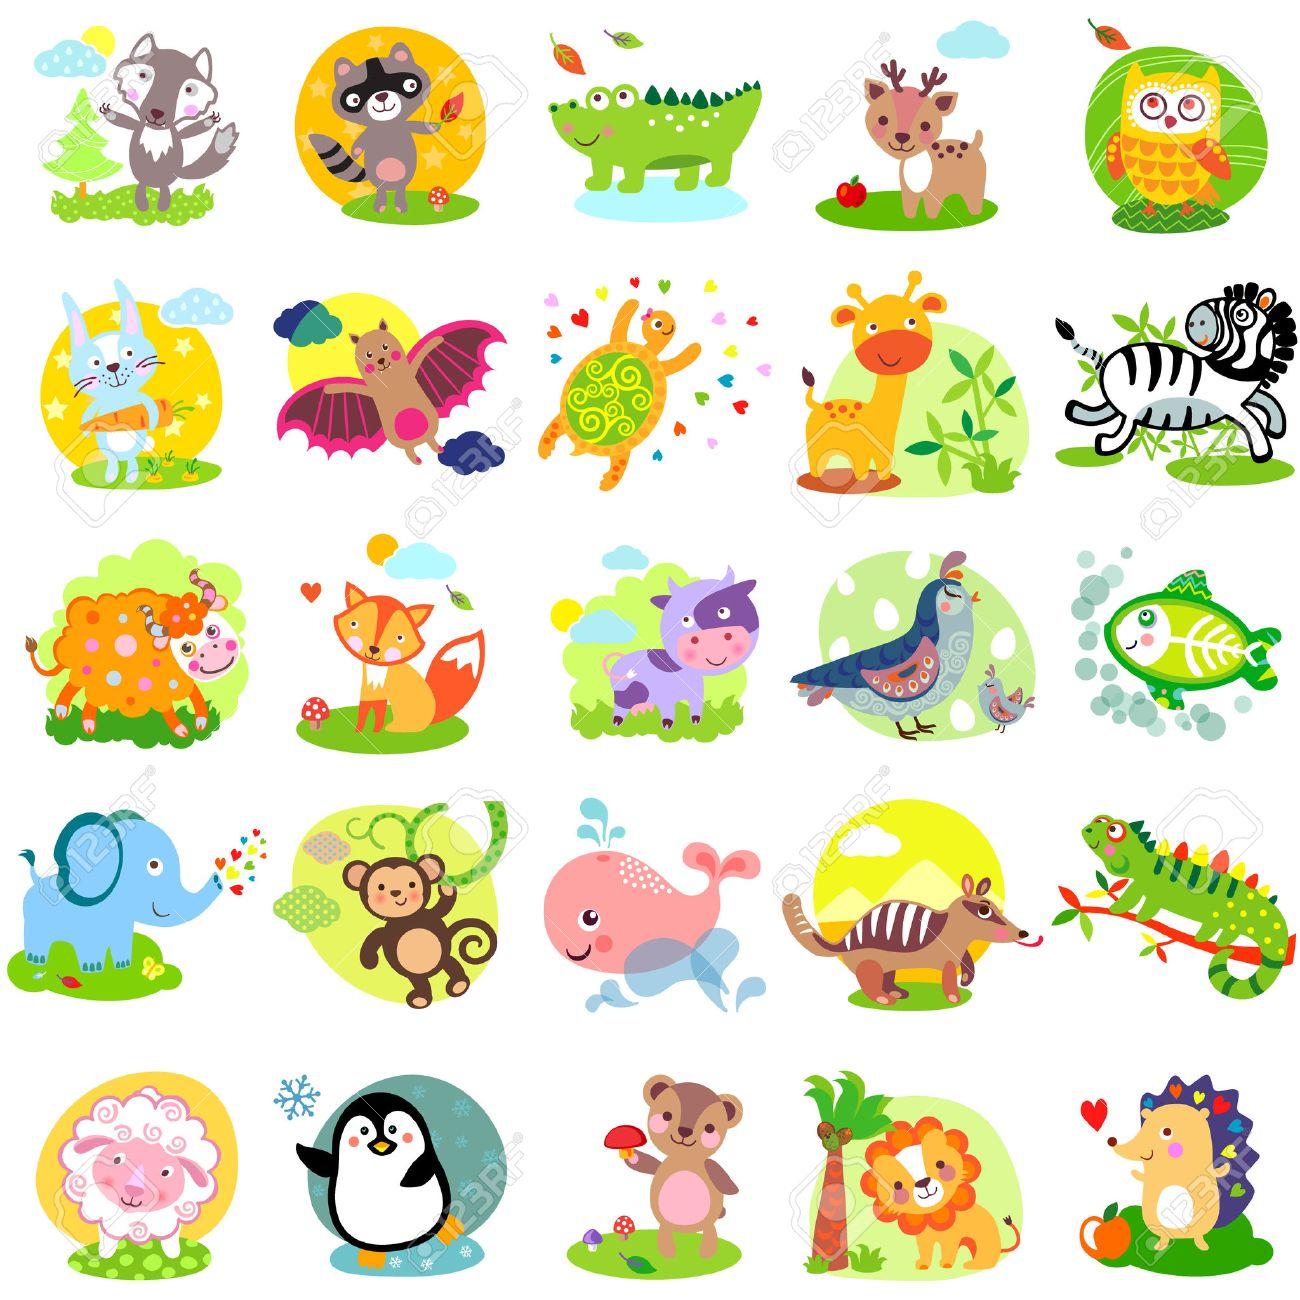 Vector illustration of cute animals and birds: wolf, raccoon, alligator, deer, owl, rabbit, bat, turtle, giraffe, zebra, yak, fox, cow, quail, bird, elephant, monkey, whale, numbat, iguanas, sheep, penguin, bear, lion, hedgehog, X-Ray Fish, bunny, hare Stock Vector - 46372853